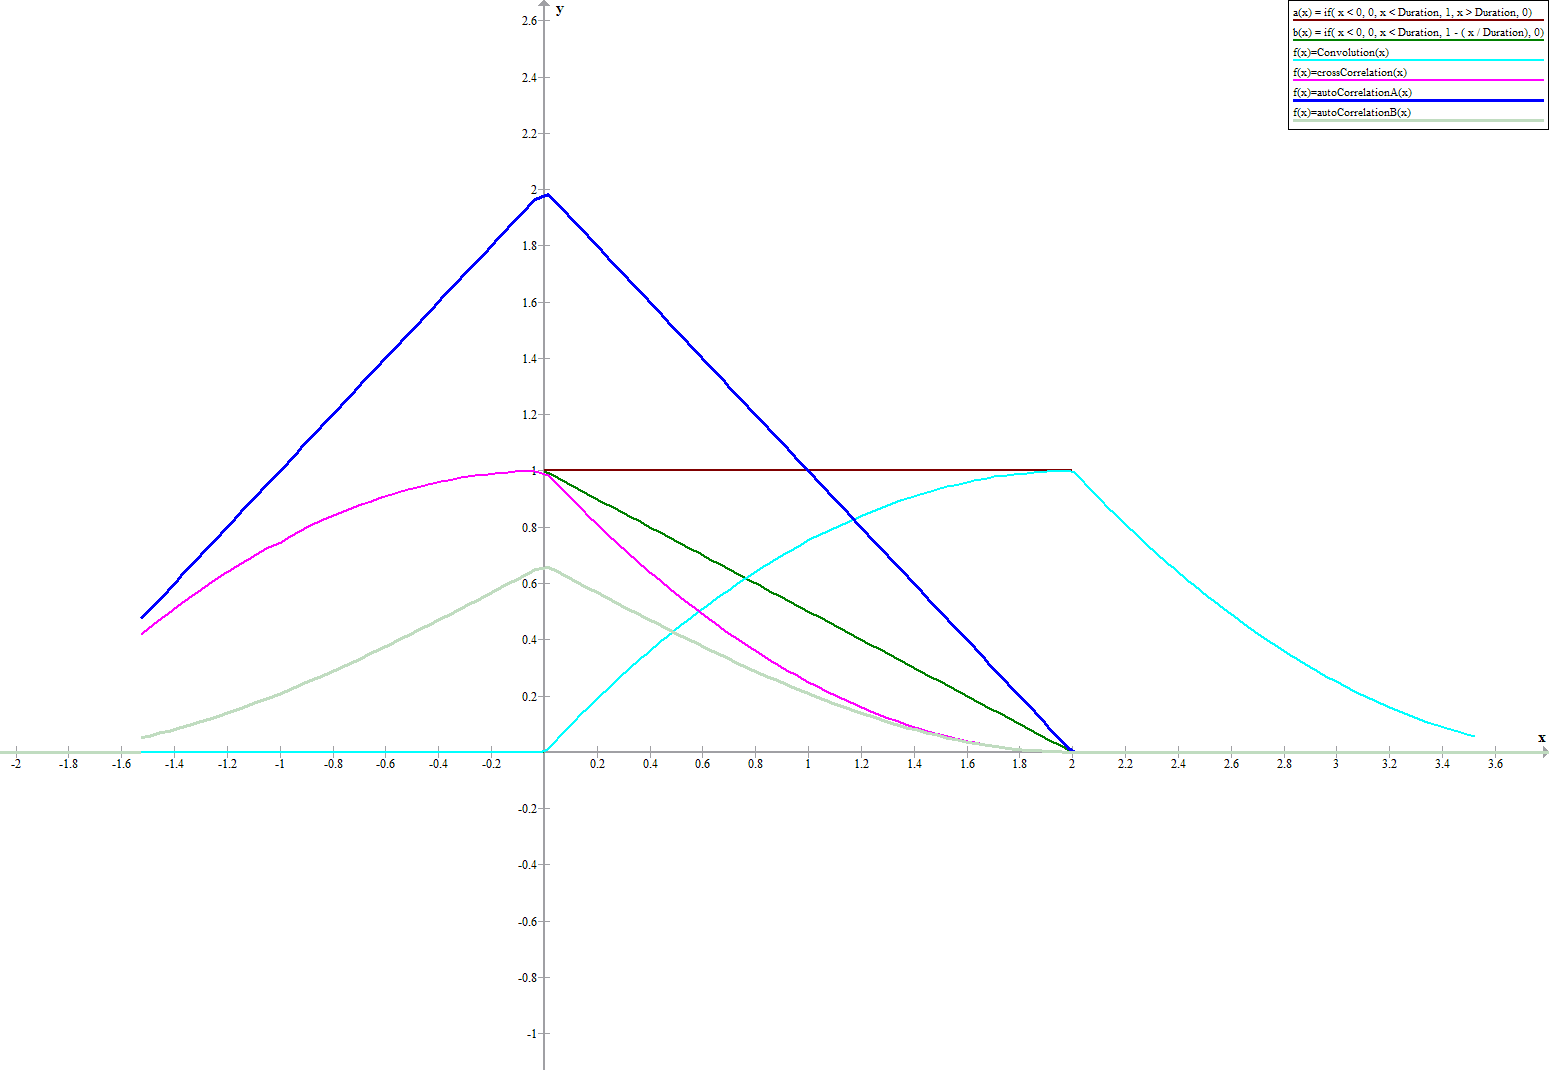 Cross_Correlation_n_Convolution_Duration=2.png